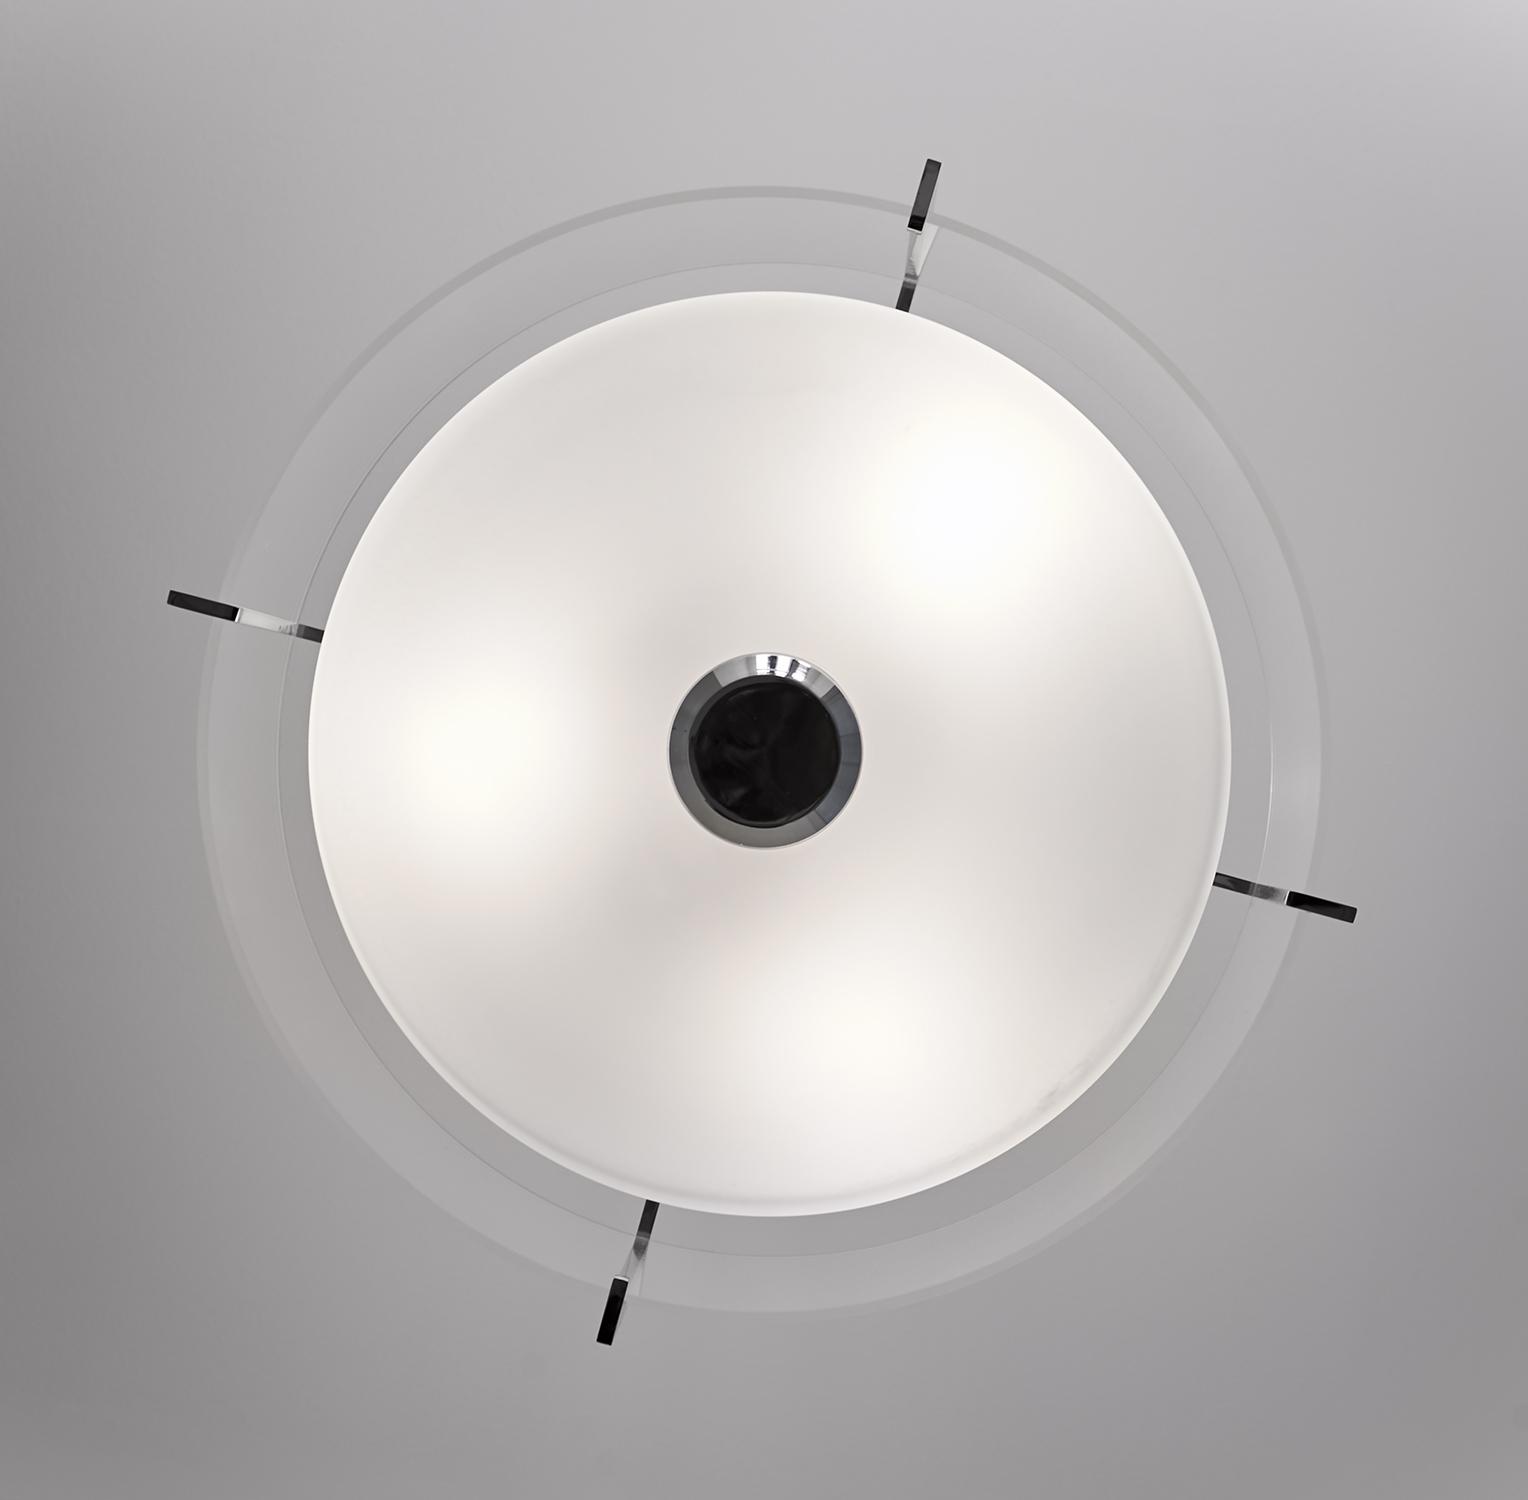 Classic Blue-Grey Bathroom Ceiling Light Fixture details